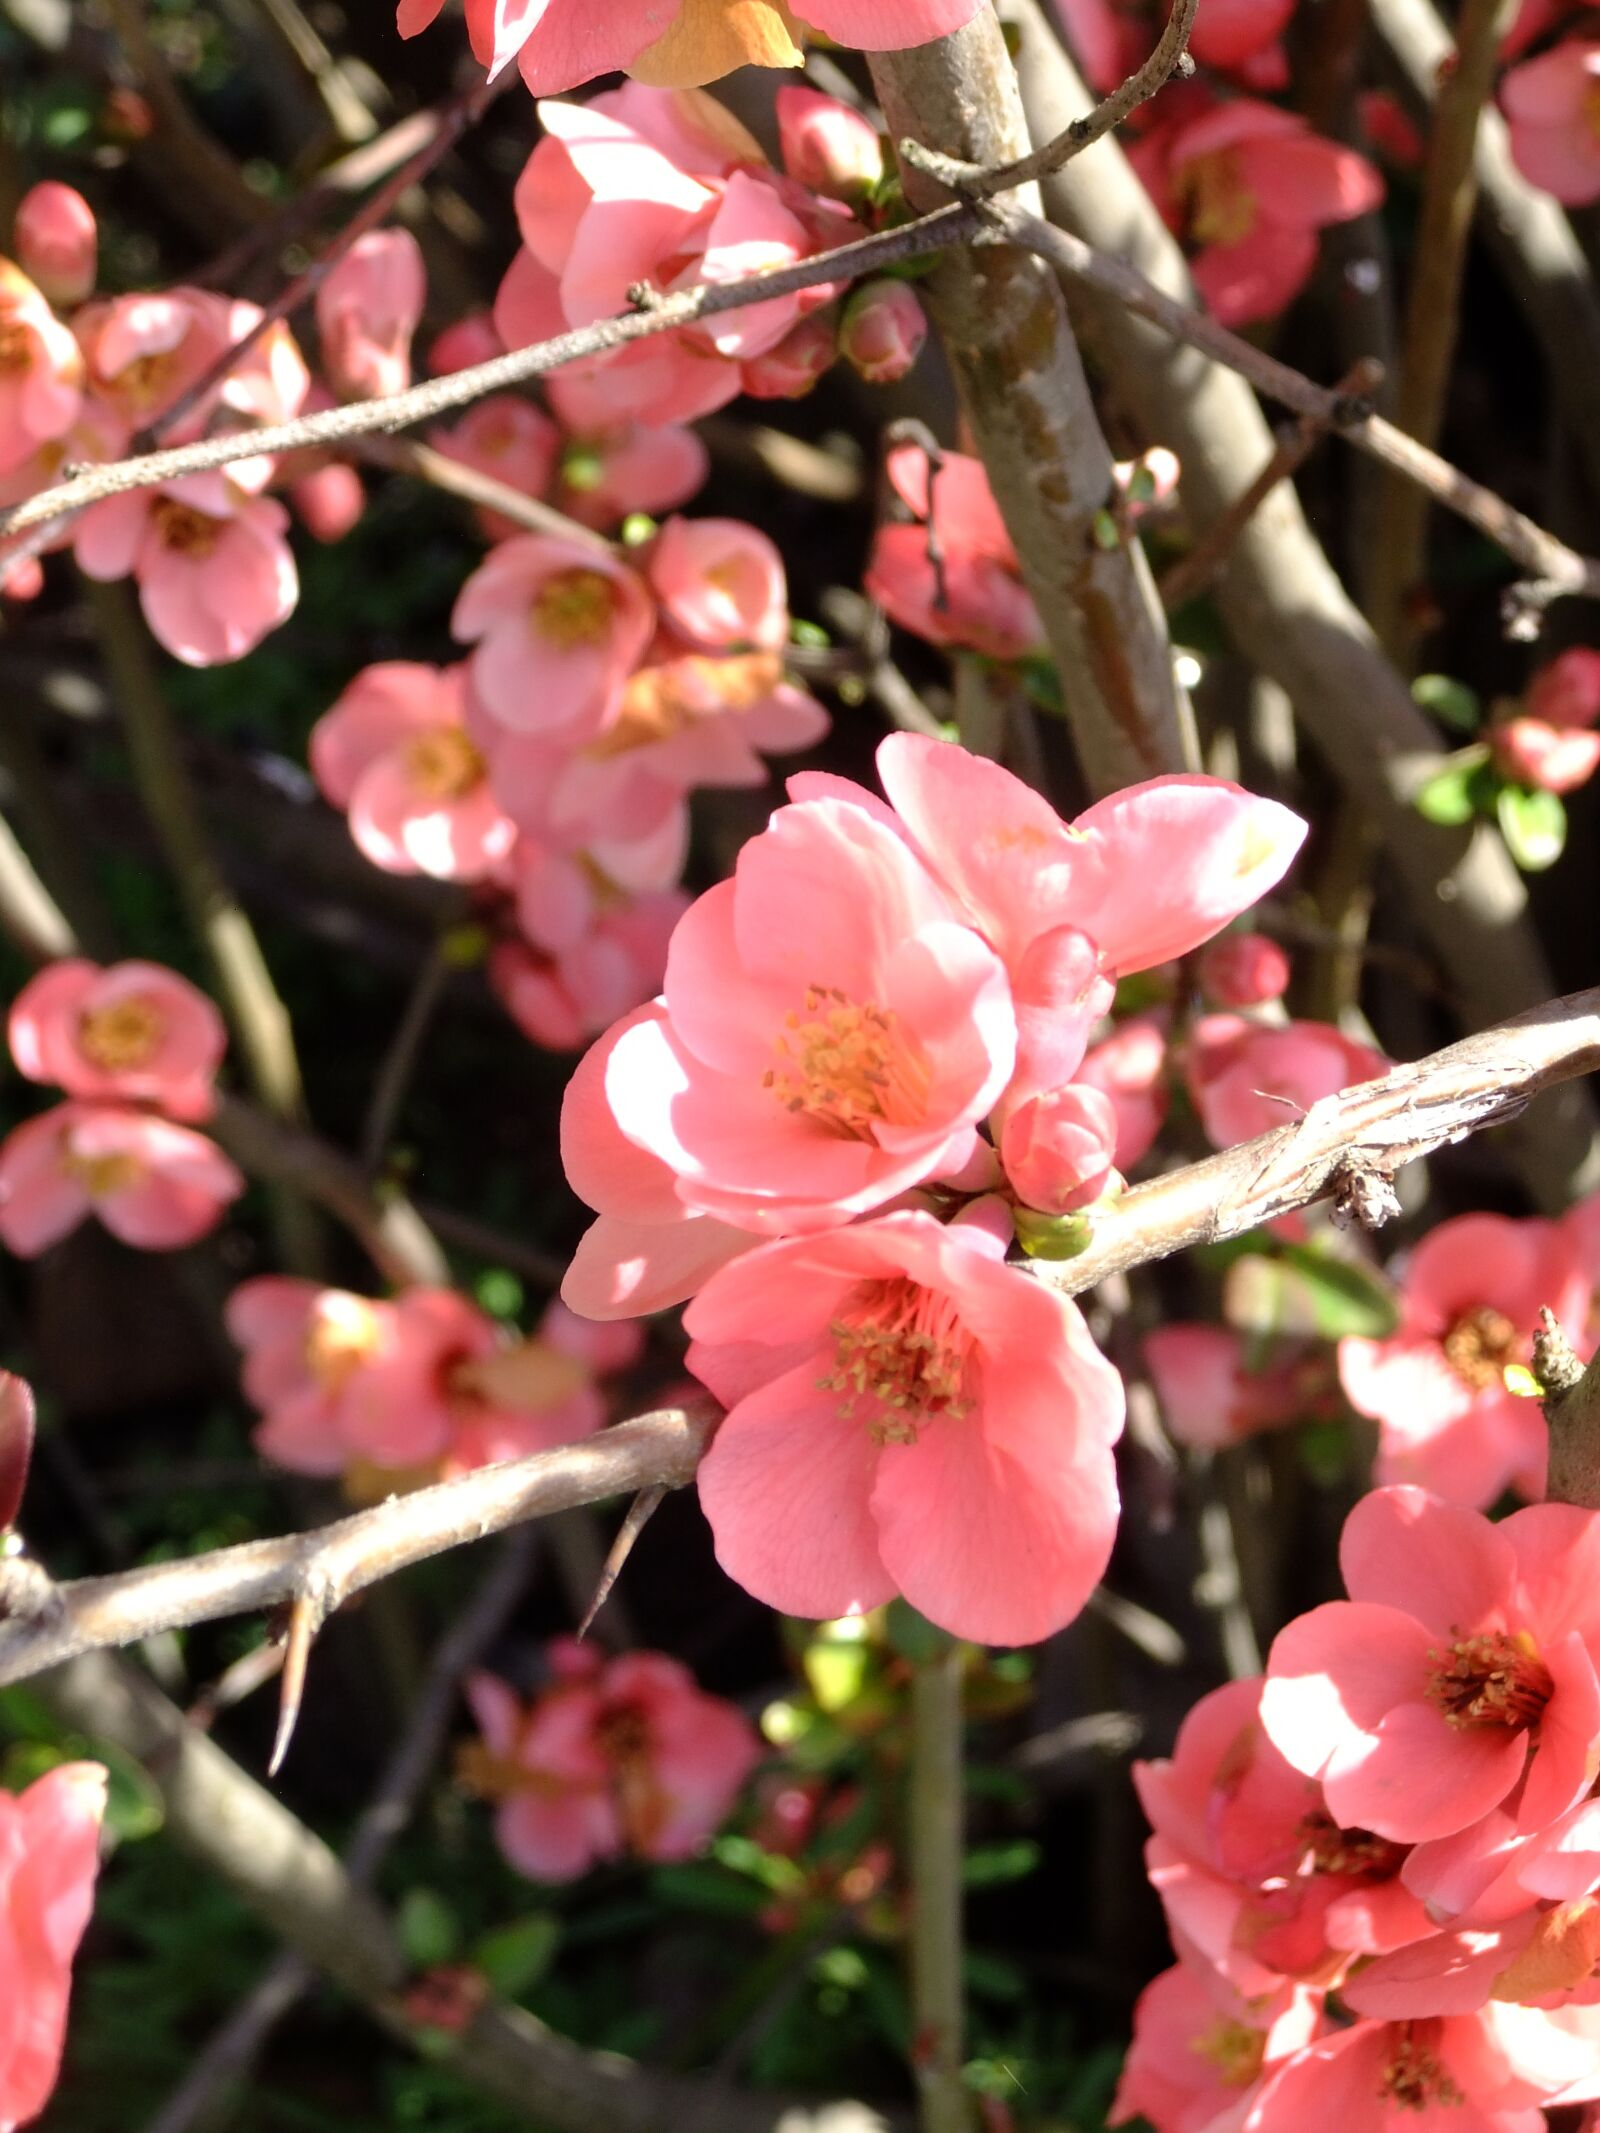 "FujiFilm FinePix JZ500 (FinePix JZ505) sample photo. ""Nature, pink, garden"" photography"